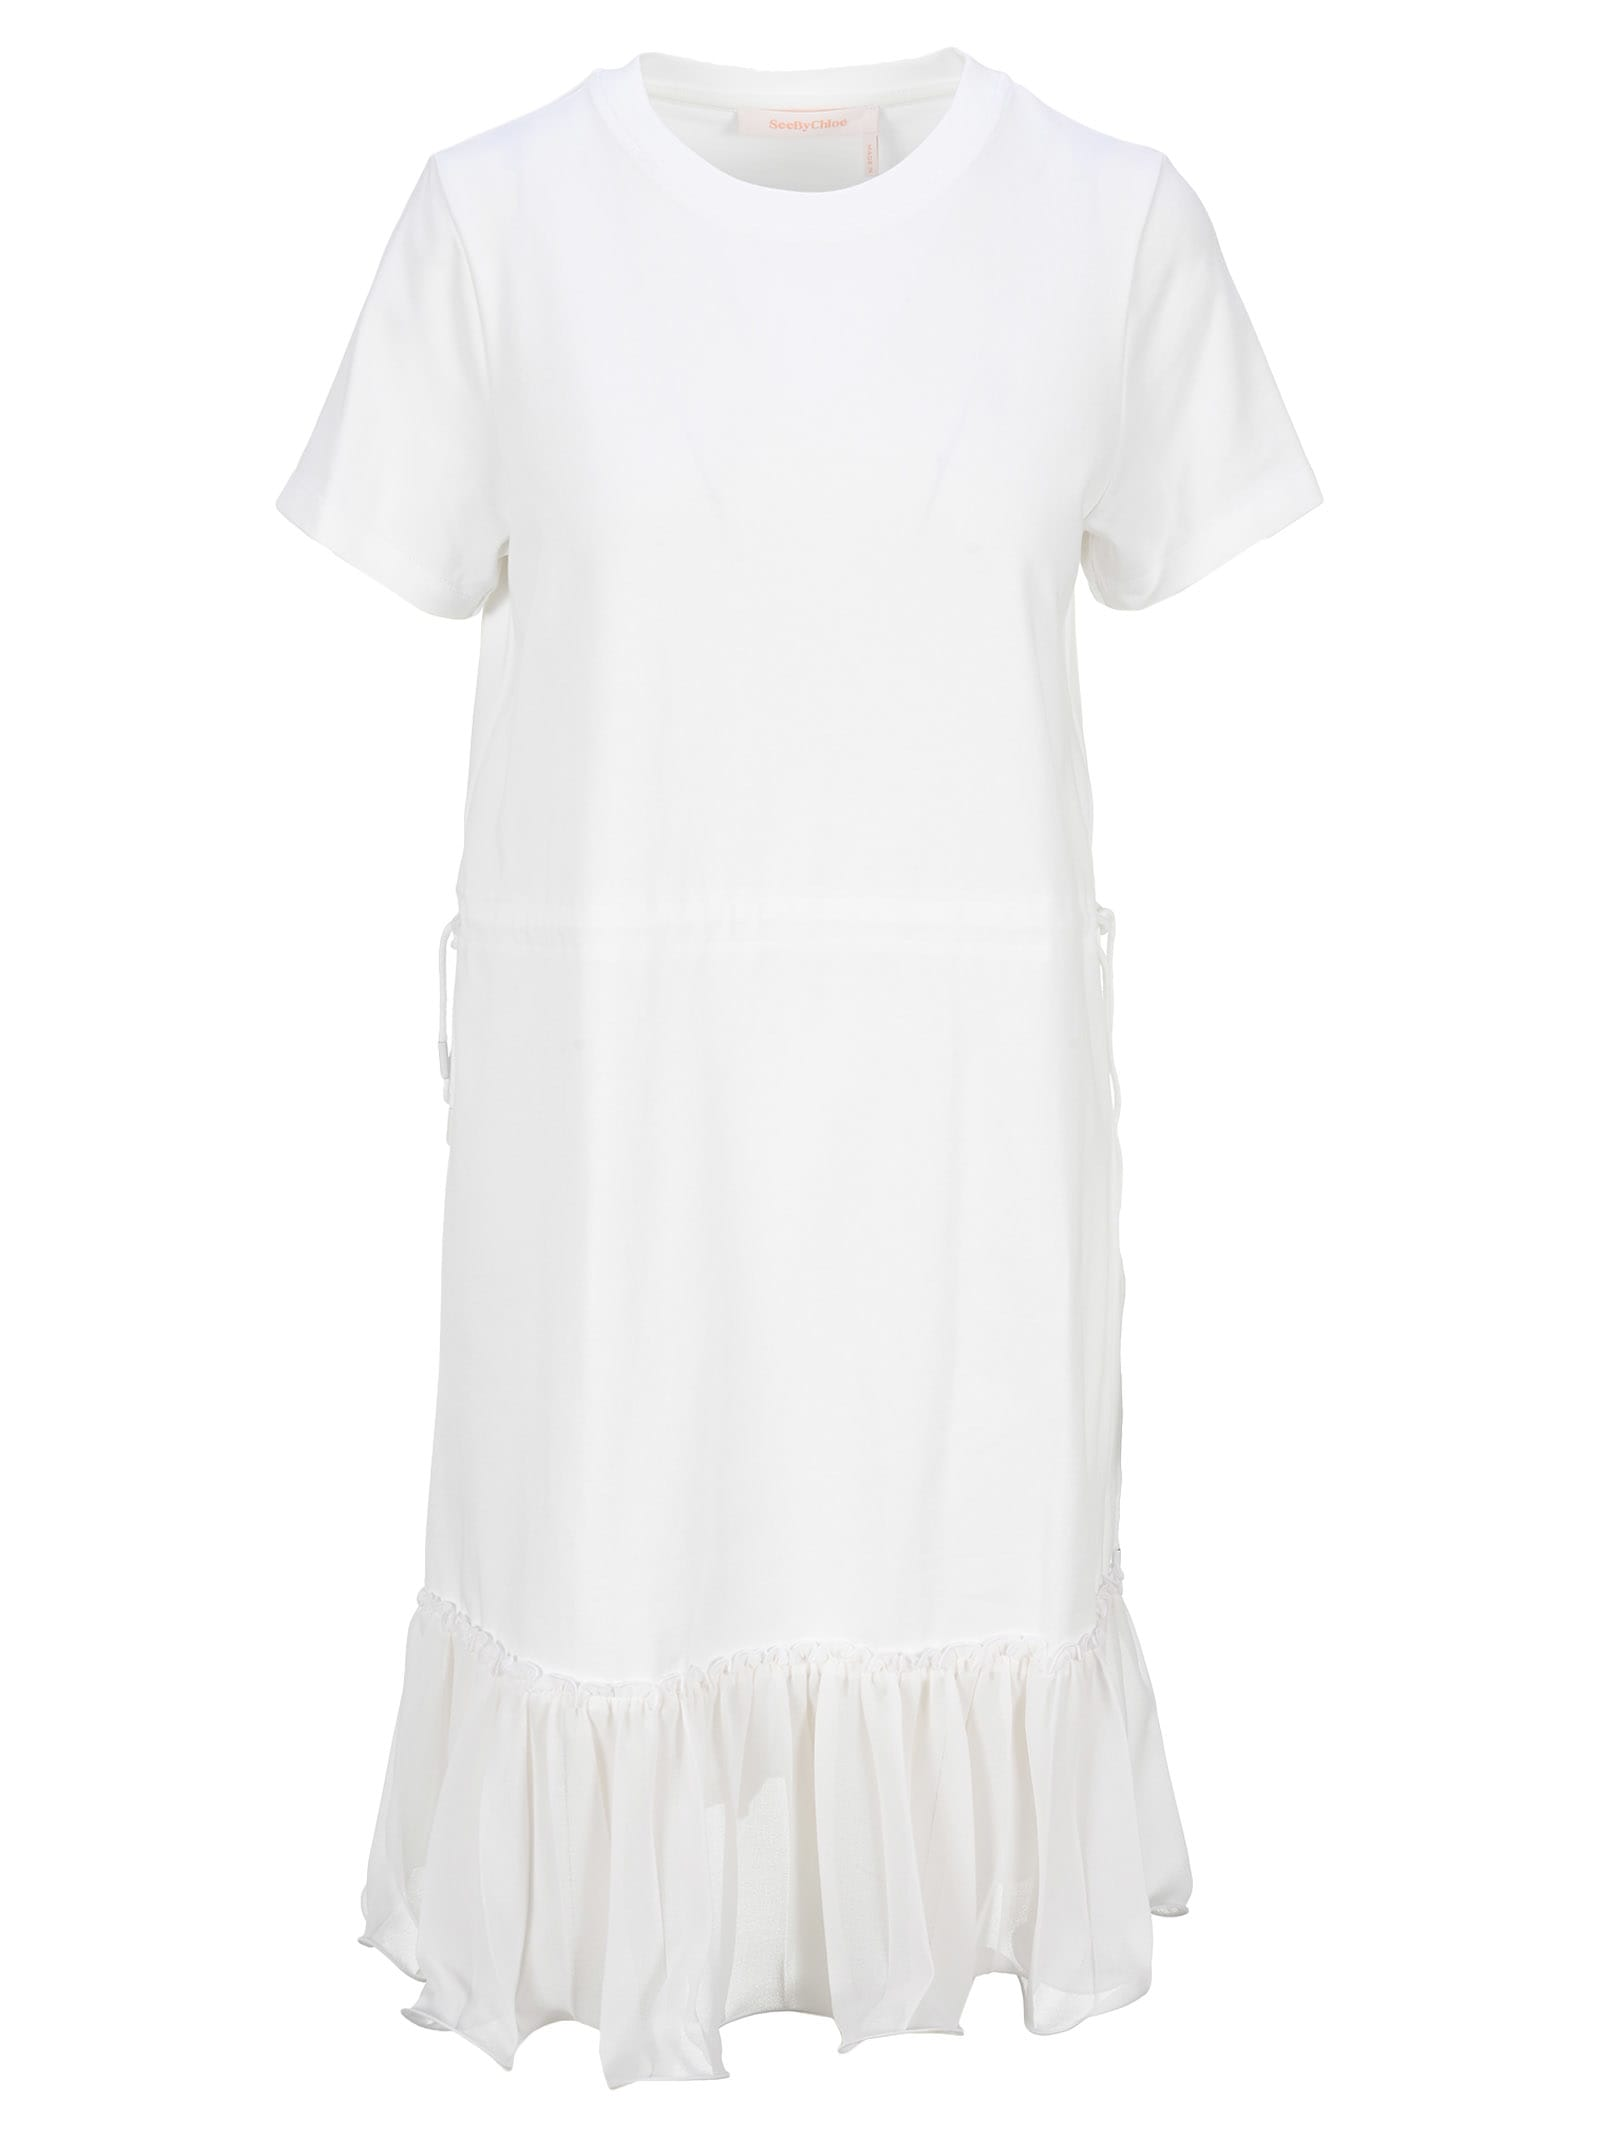 See By Chloe T-shirt Dress